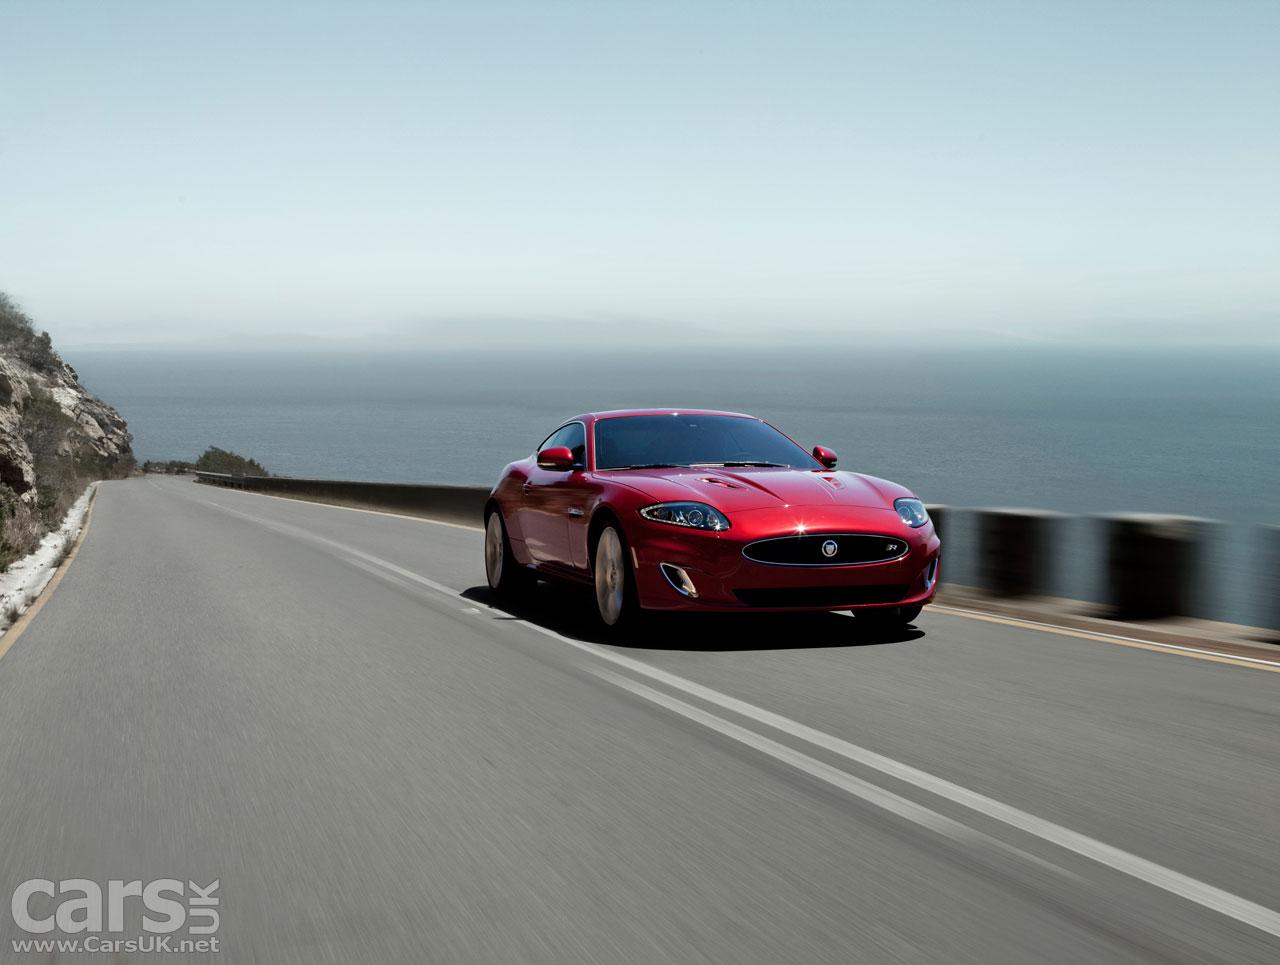 2012 Jaguar XK Photo Gallery